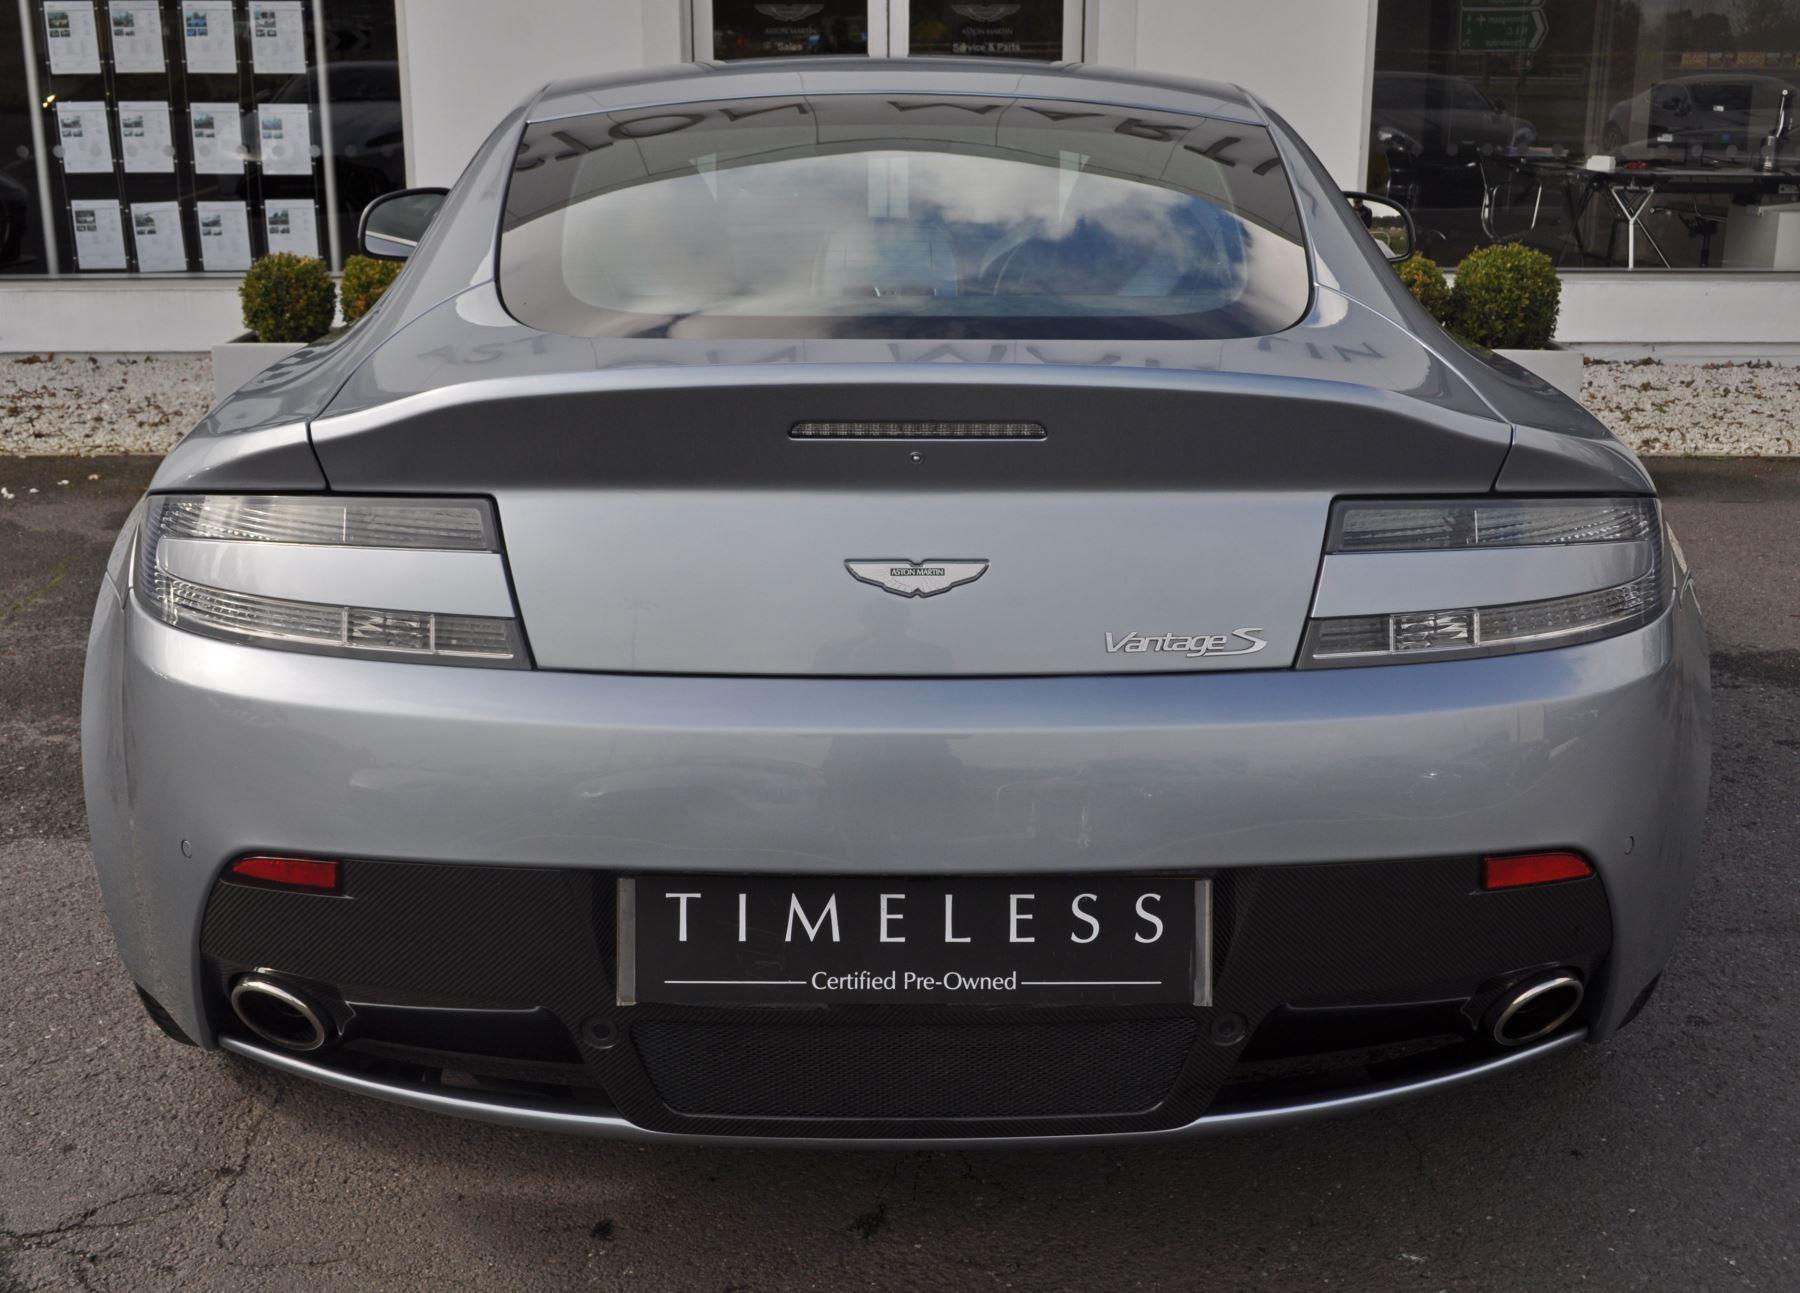 Aston Martin V8 Vantage S Coupe Coupe image 9